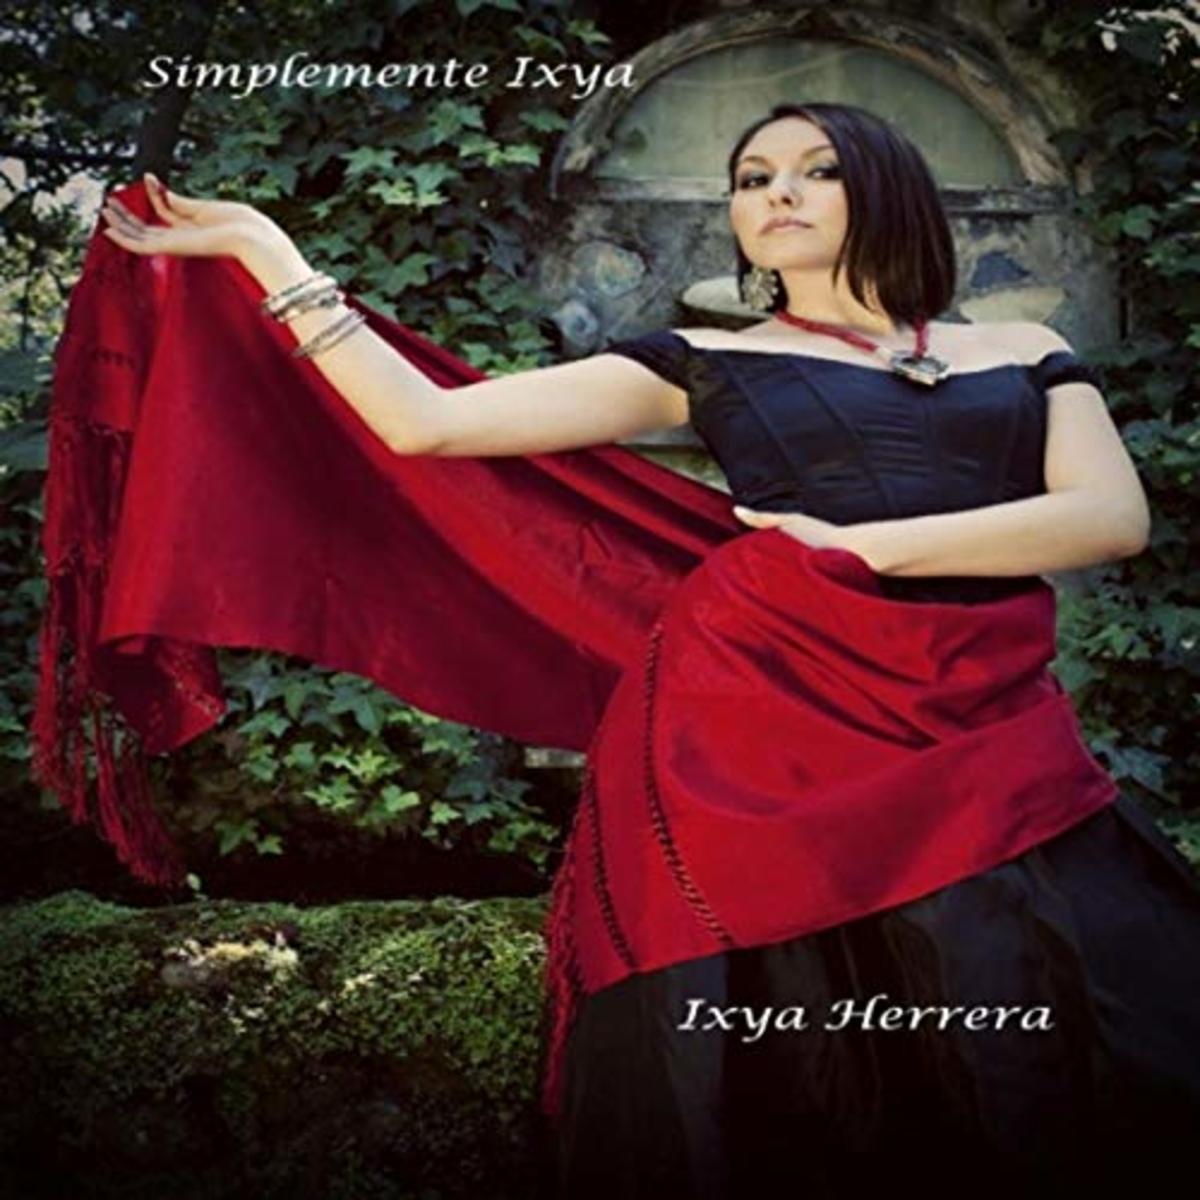 Jose Alfredo Jimenez's El Rey and Ixya Herrera's El Pastor: An Analysis of Two Mariachi Style Songs